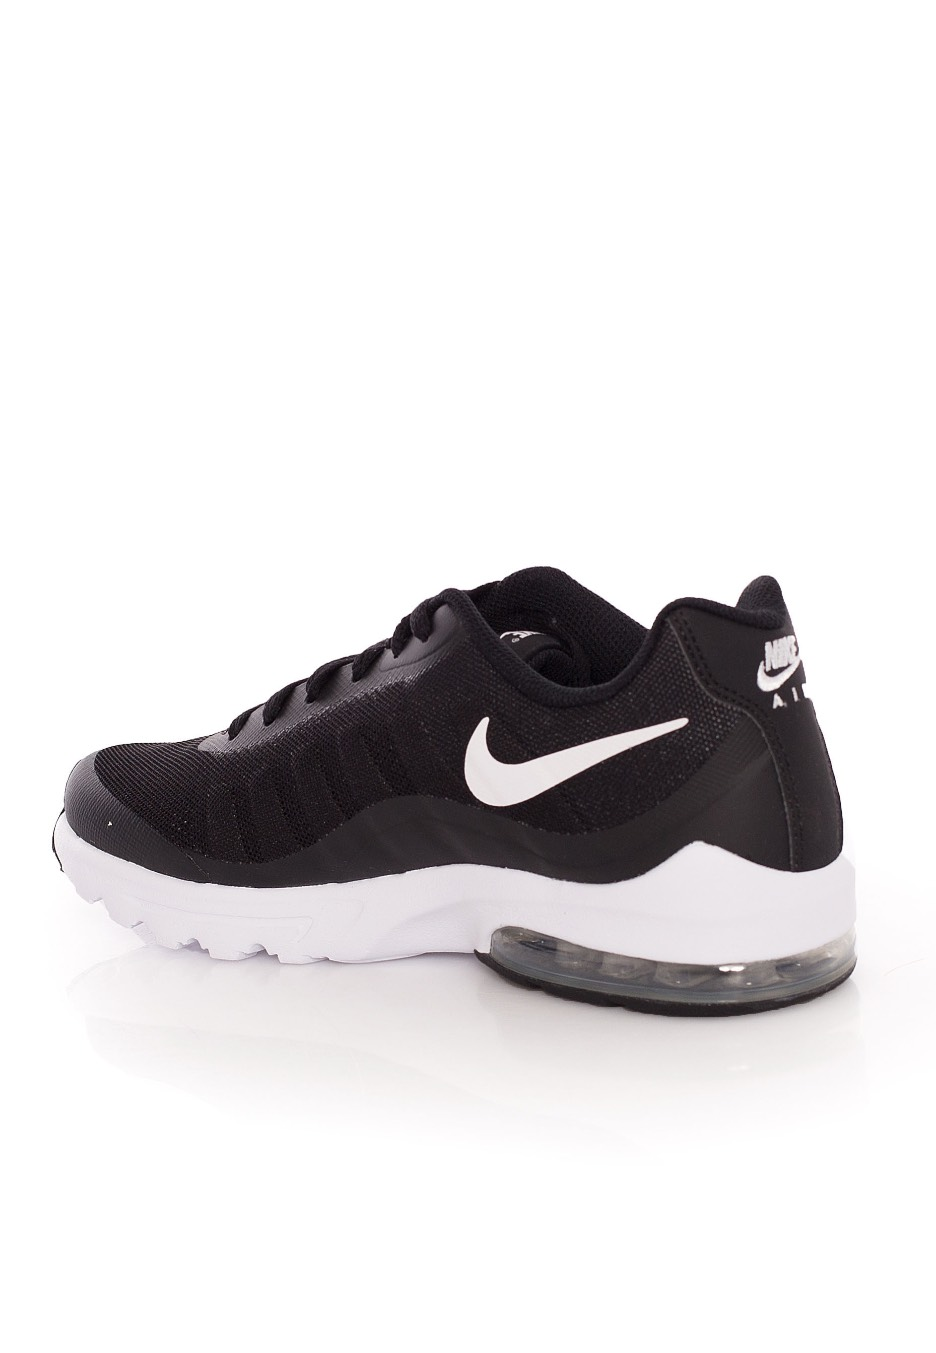 quality design 84c9b 9a445 ... real nike air max invigor black white shoes e984a 006b8